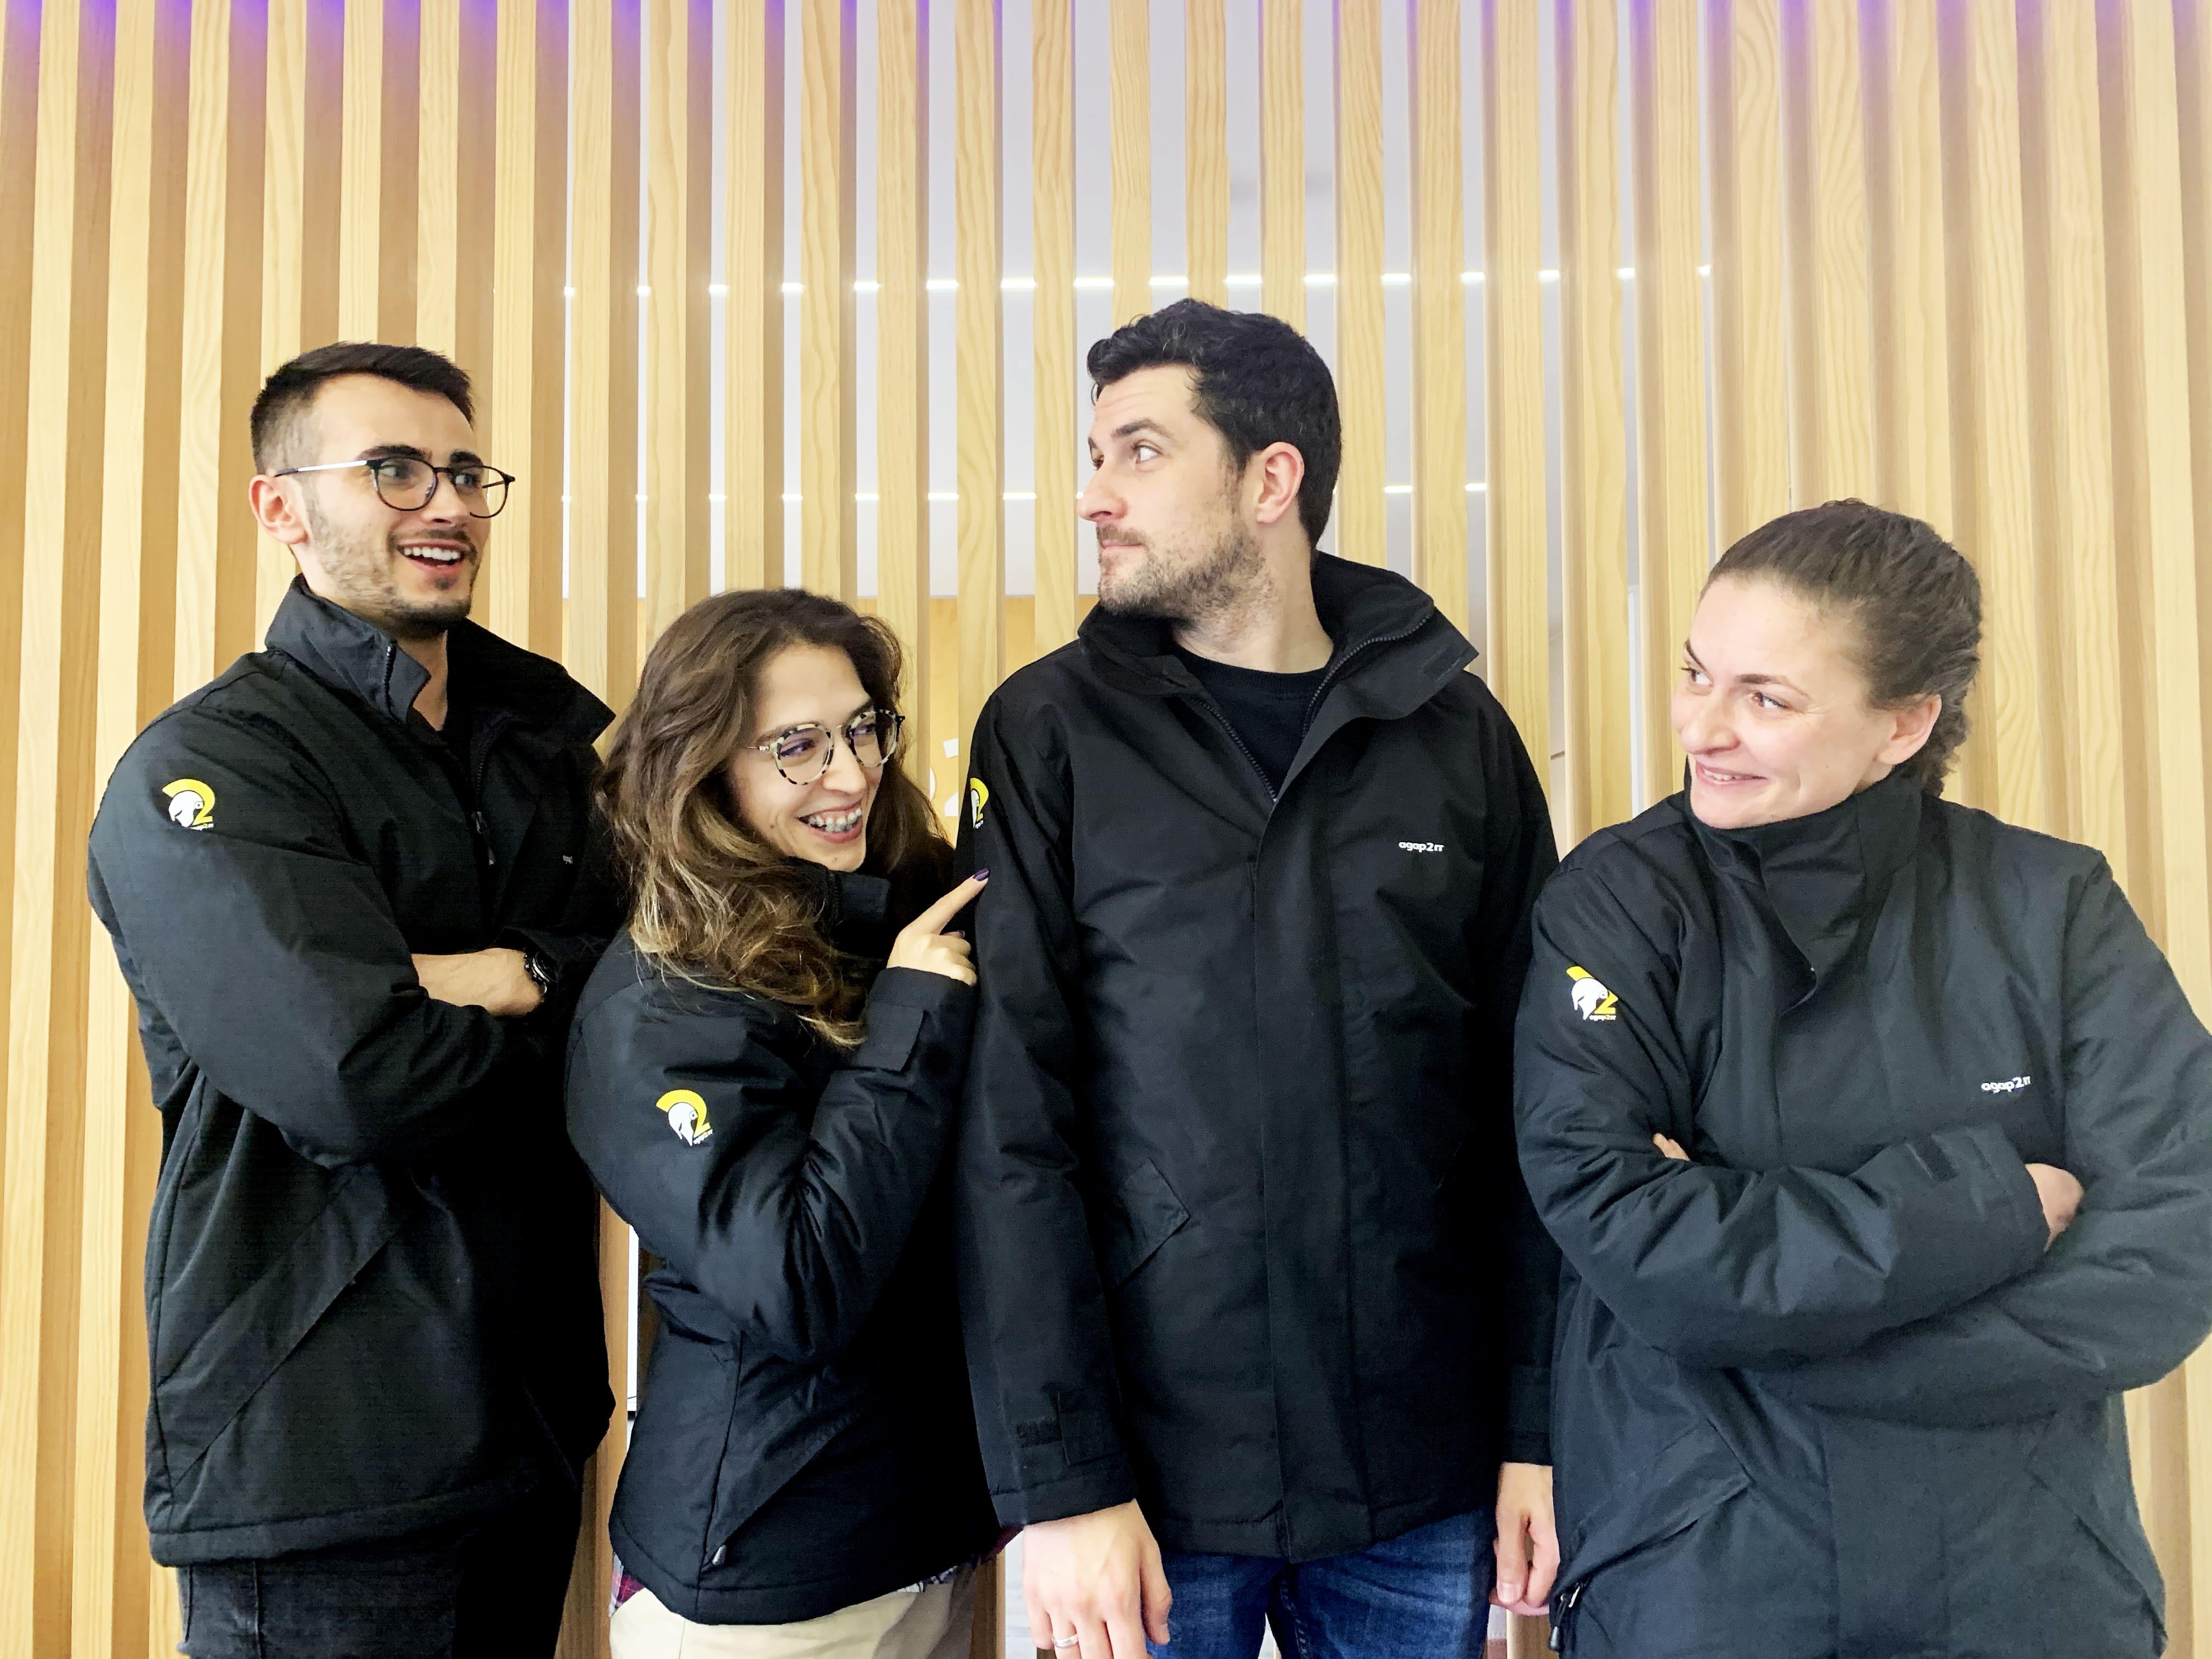 A agap2IT prepara-se para implementar um projeto de Employer Branding